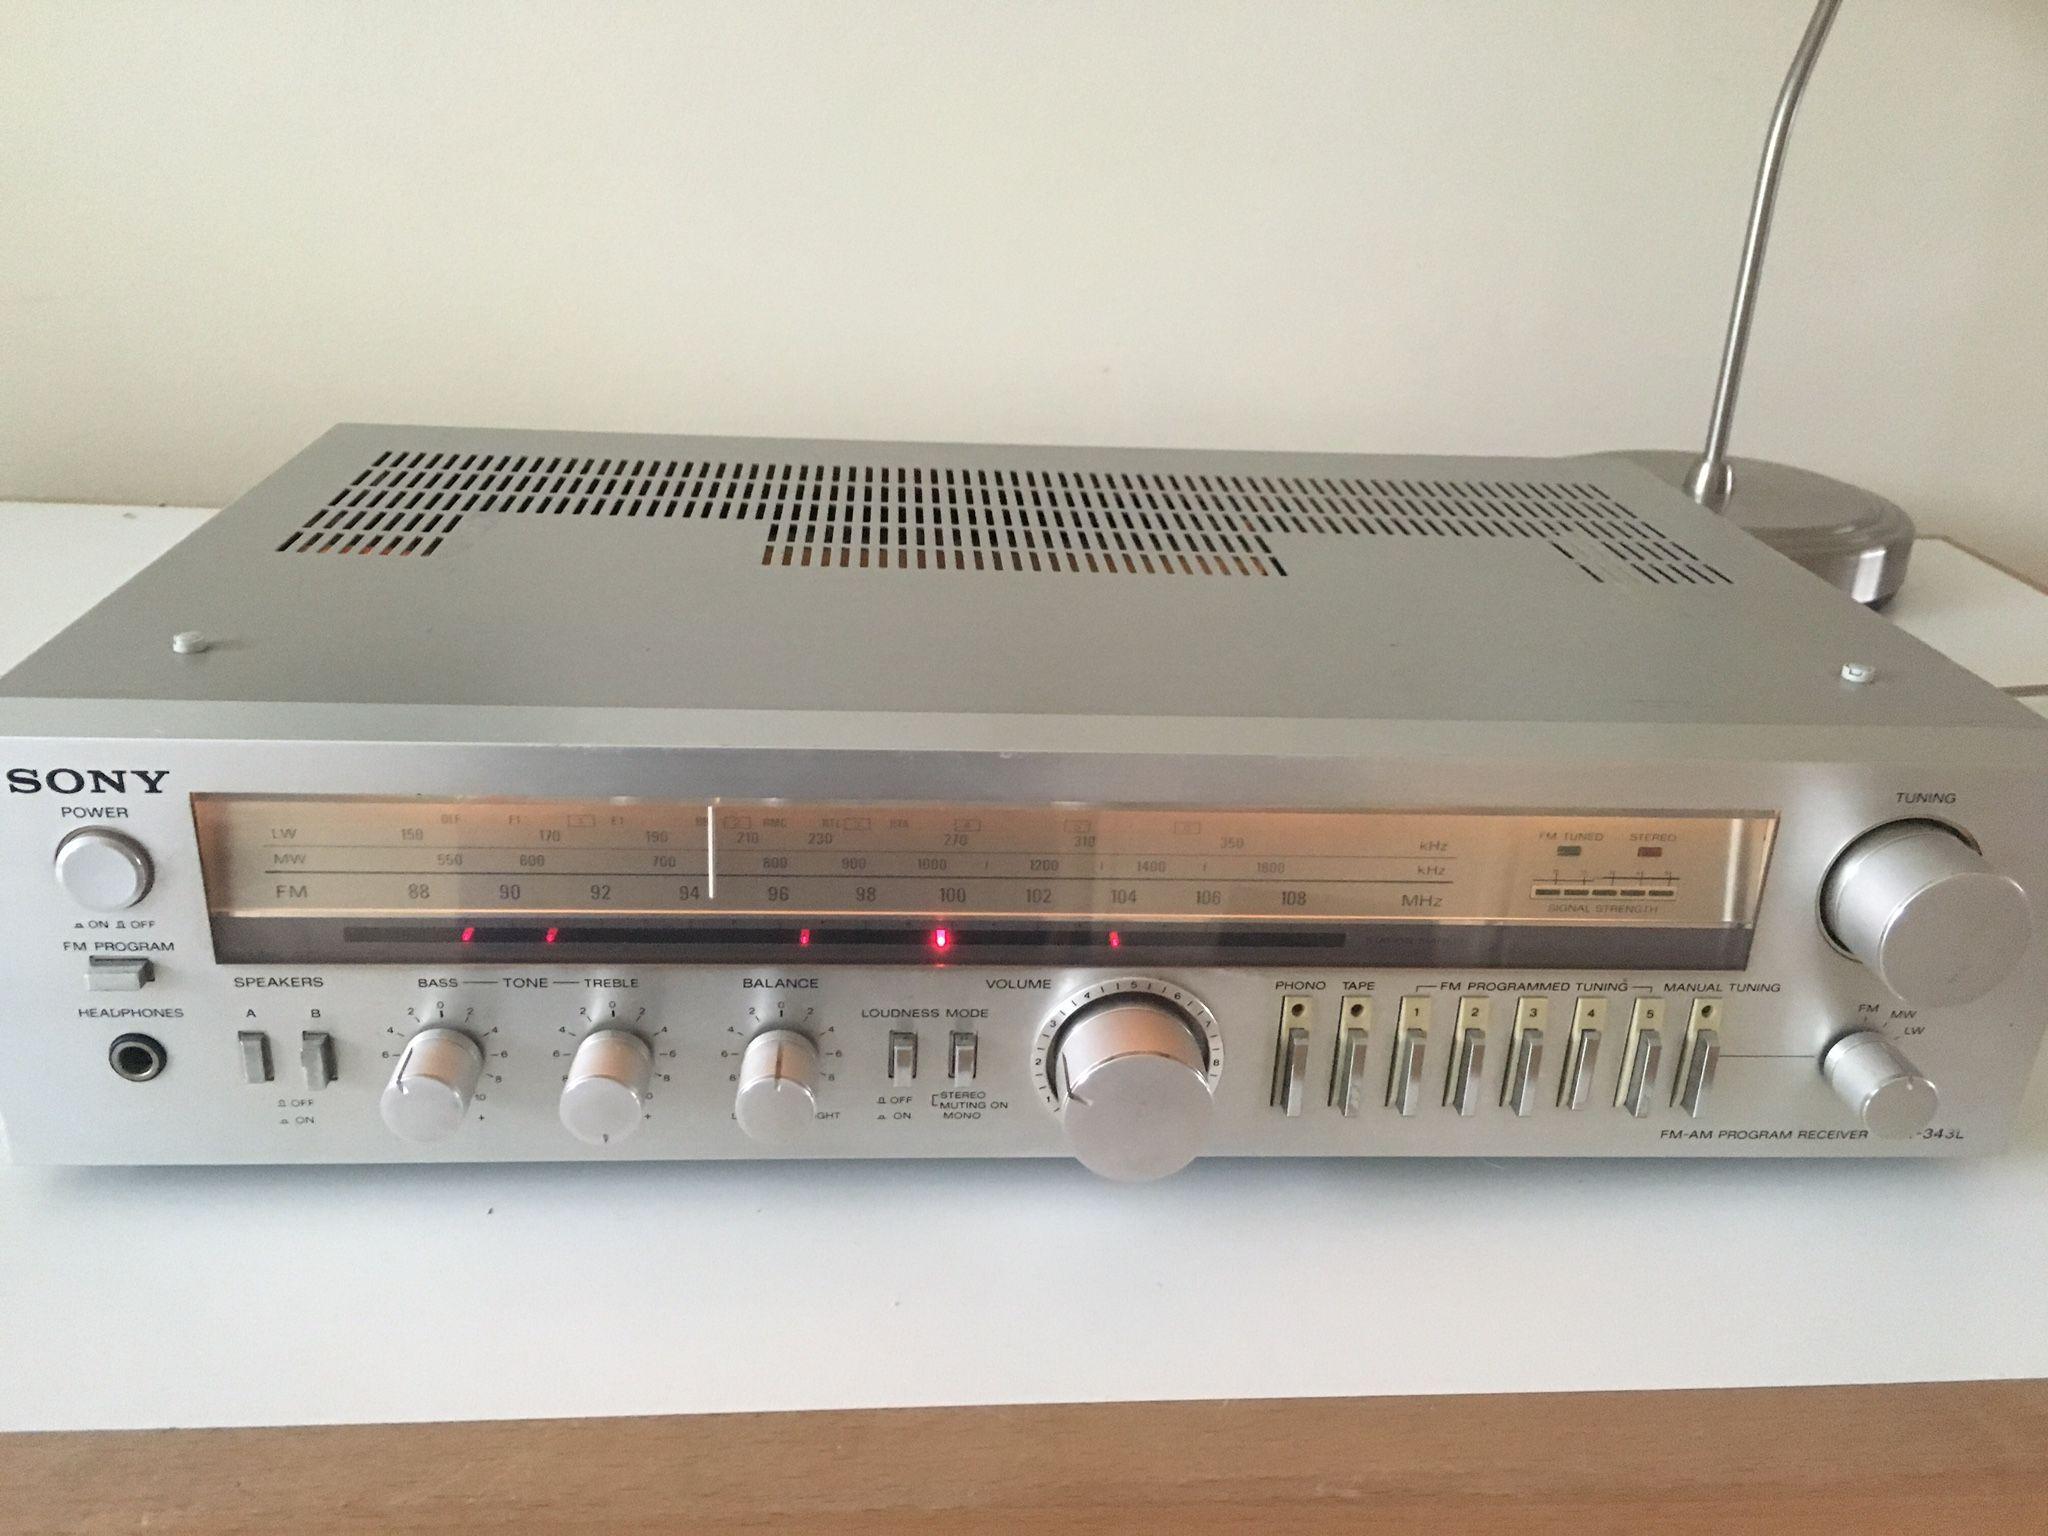 Uitgelezene Sony tuner/amp STR 343 L, appr 1983 | Vintage audio TB-43